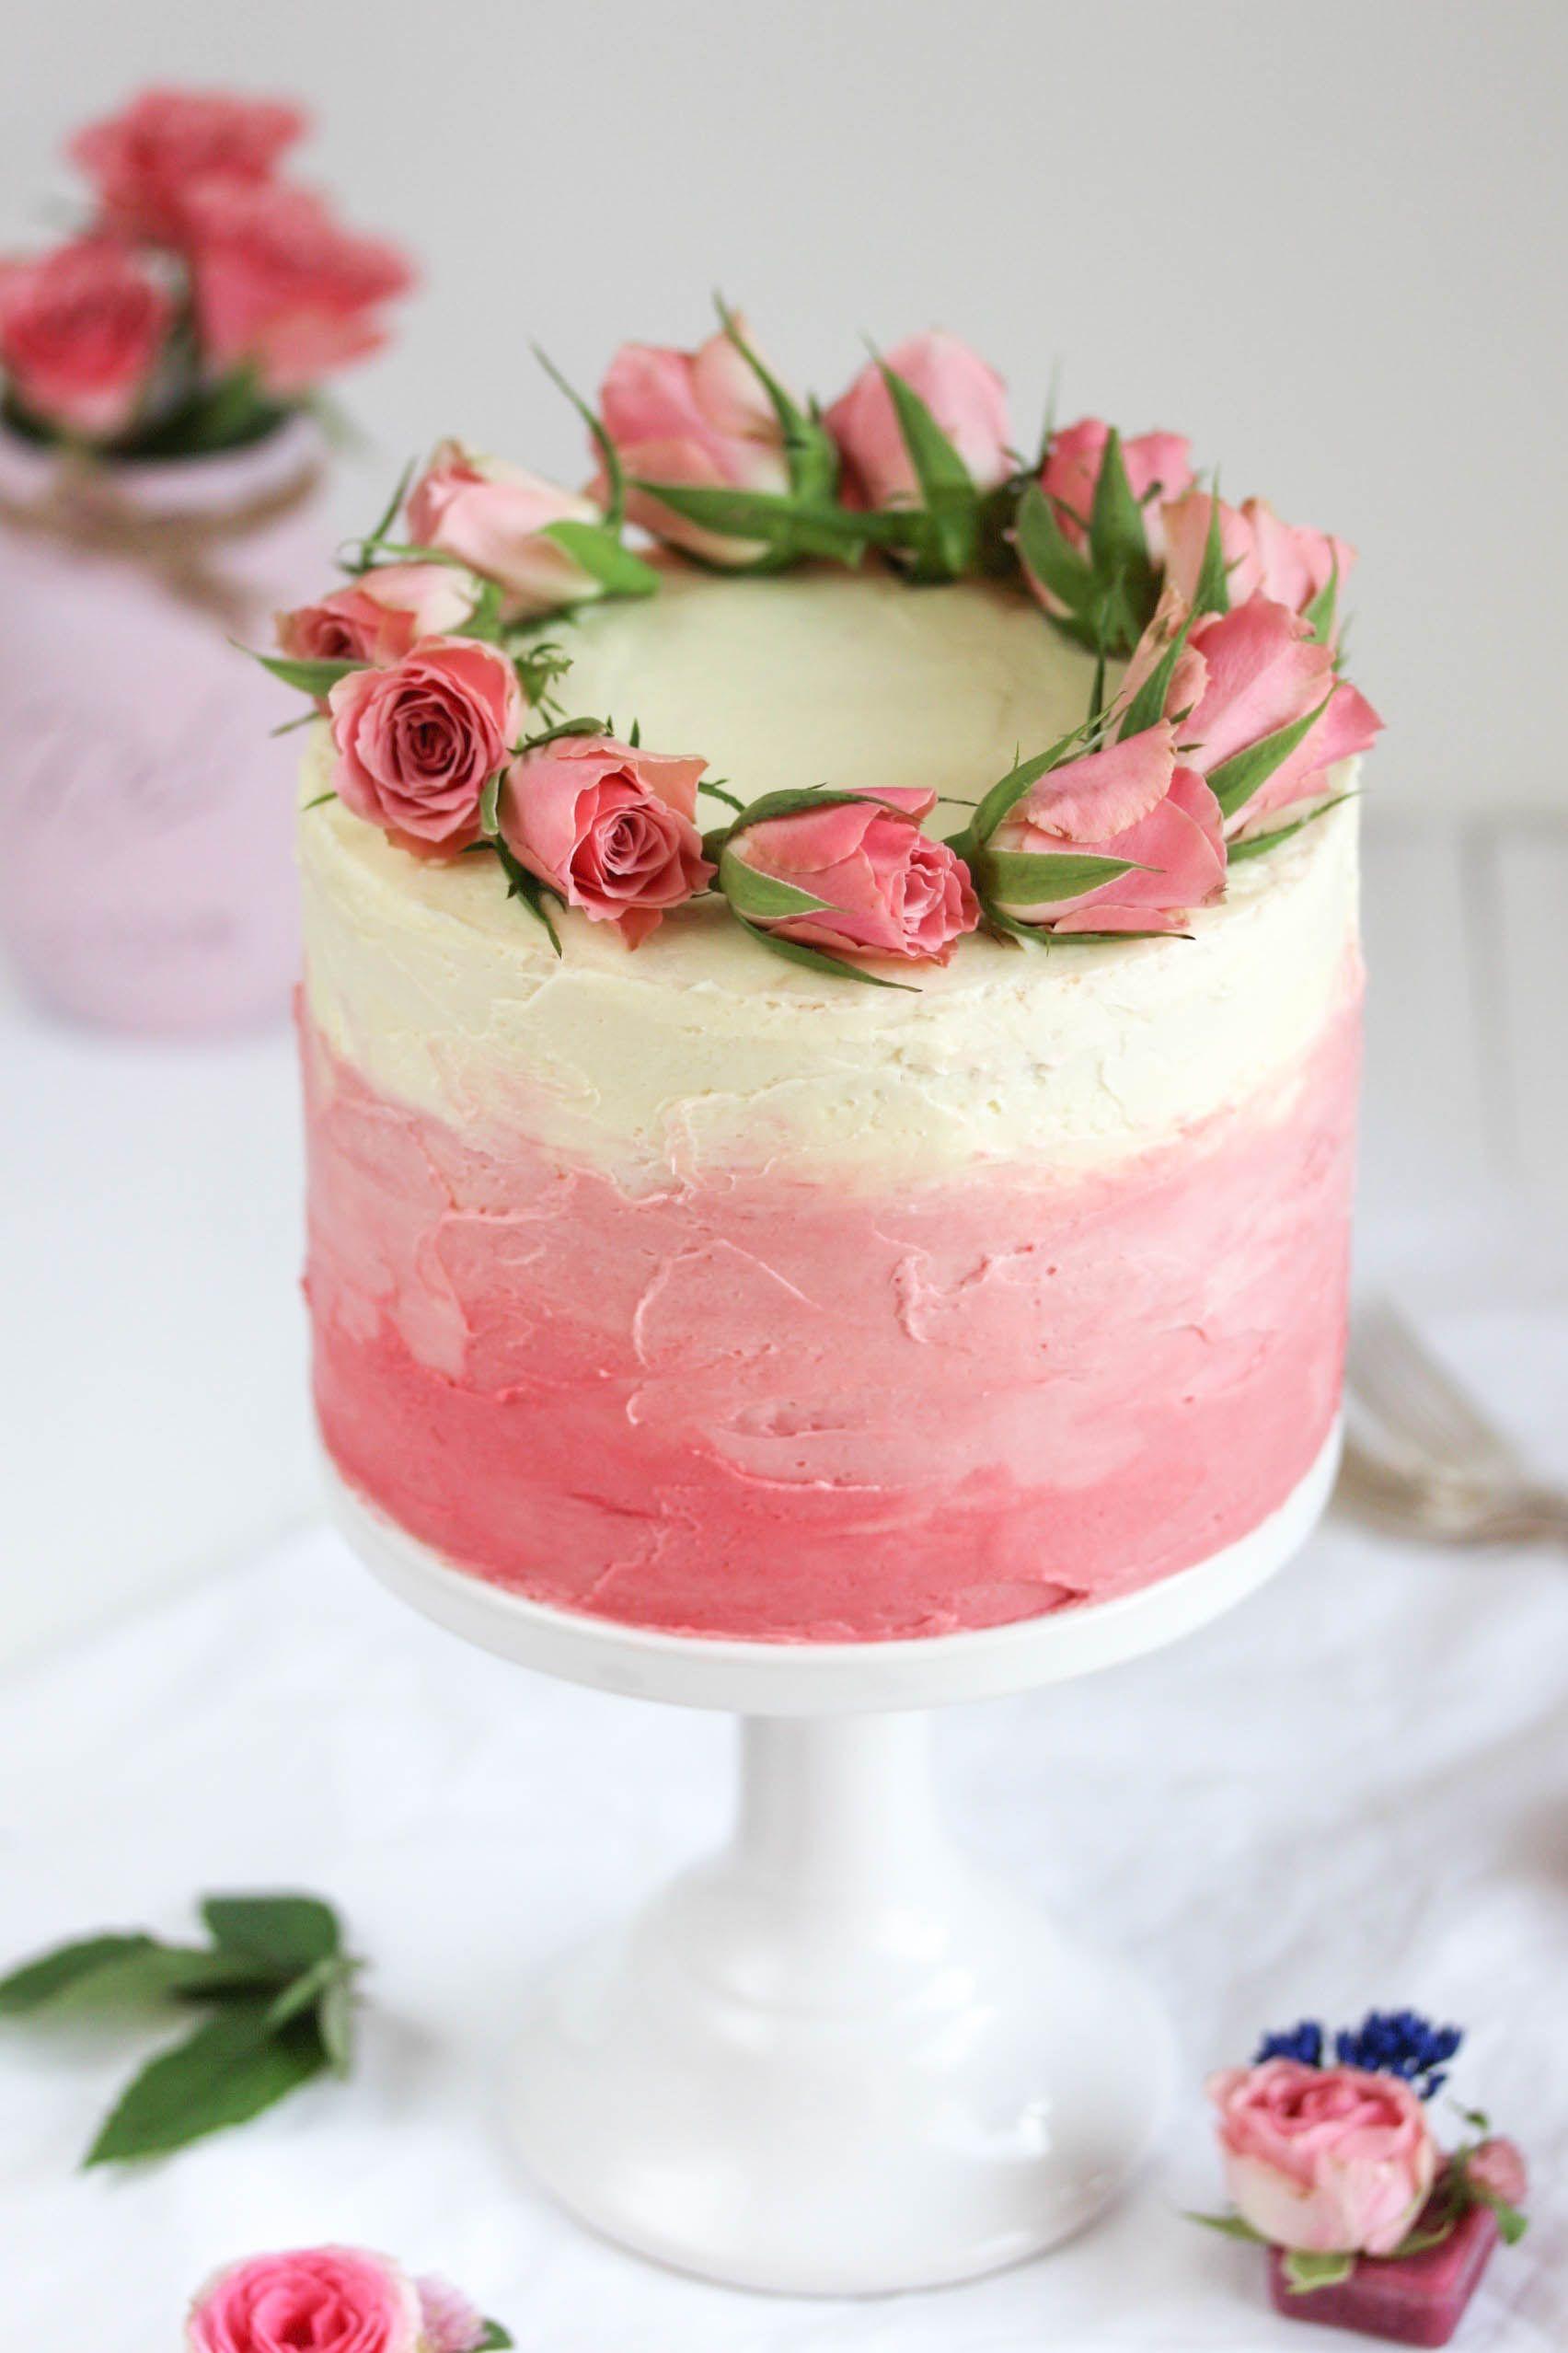 Himbeer-Ombré-Törtchen und hübsche Blümchen | Cakes!!! | Pinterest ...